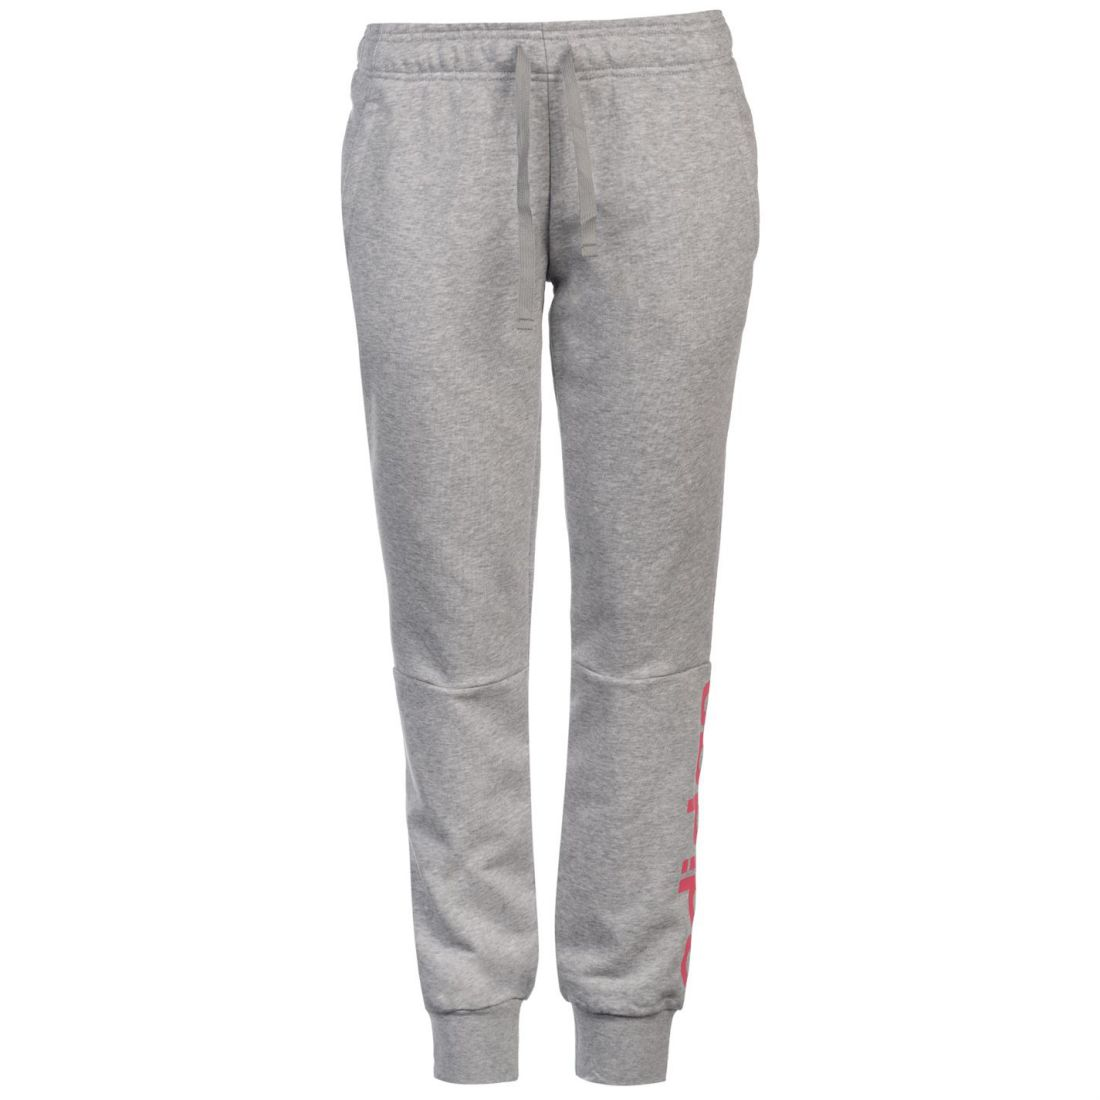 a04e6ebda41b adidas Womens Linear Closed Hem Sweat Pants Fleece Jogging Bottoms ...